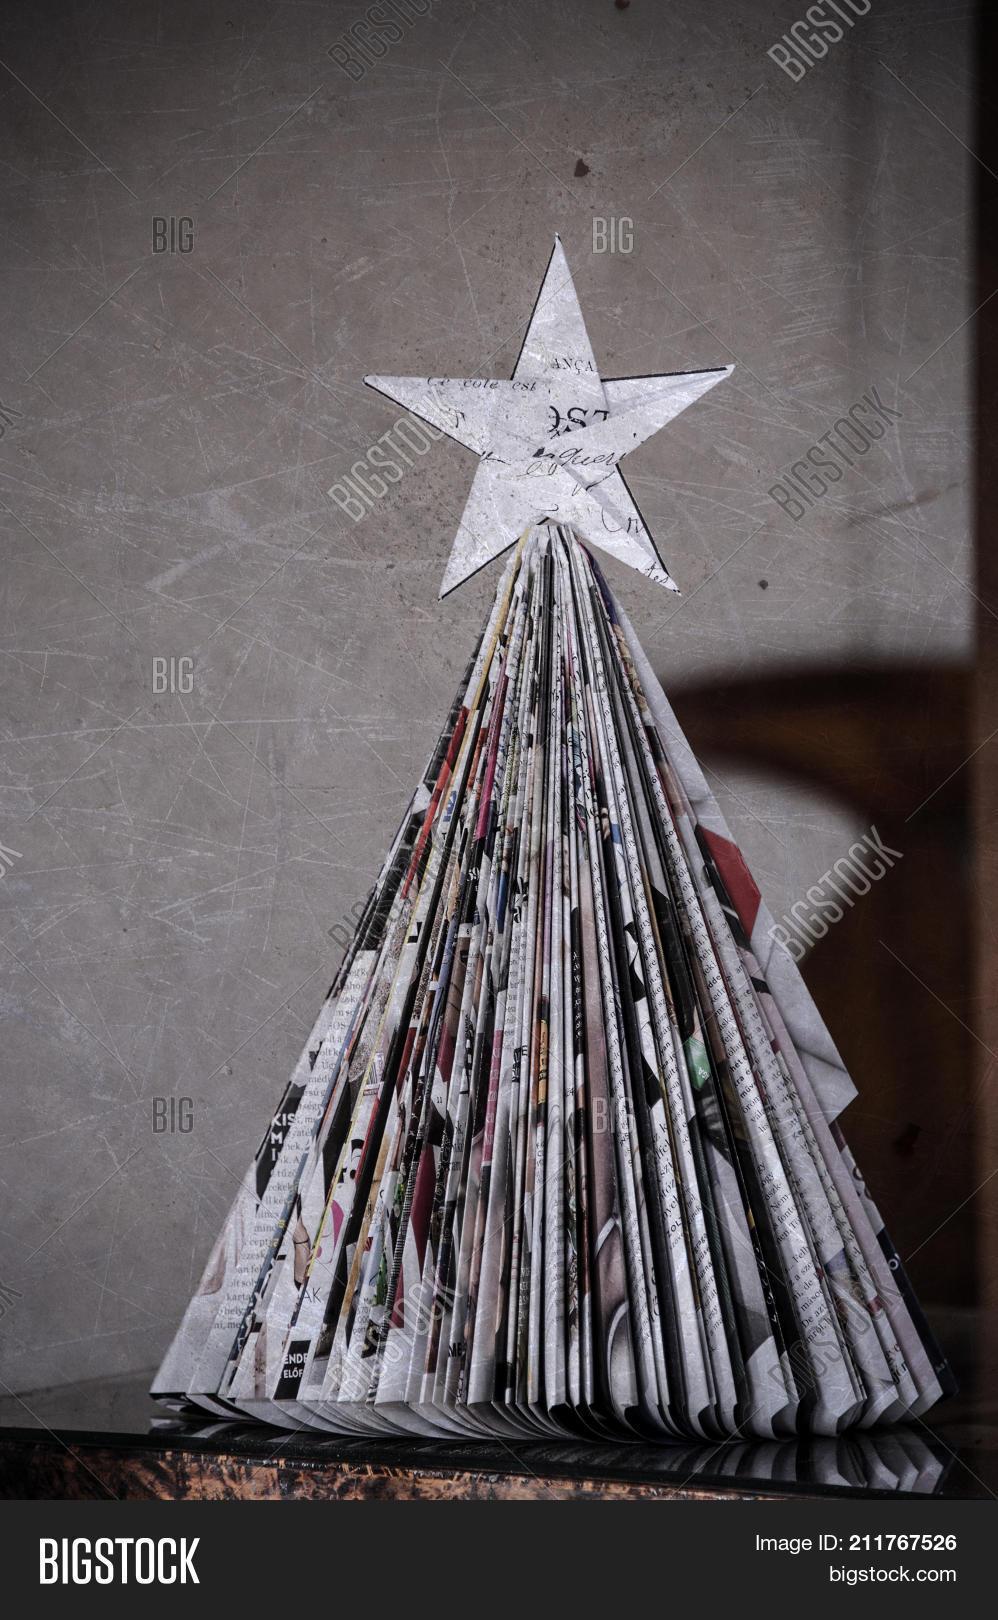 paper christmas tree image photo free trial bigstock